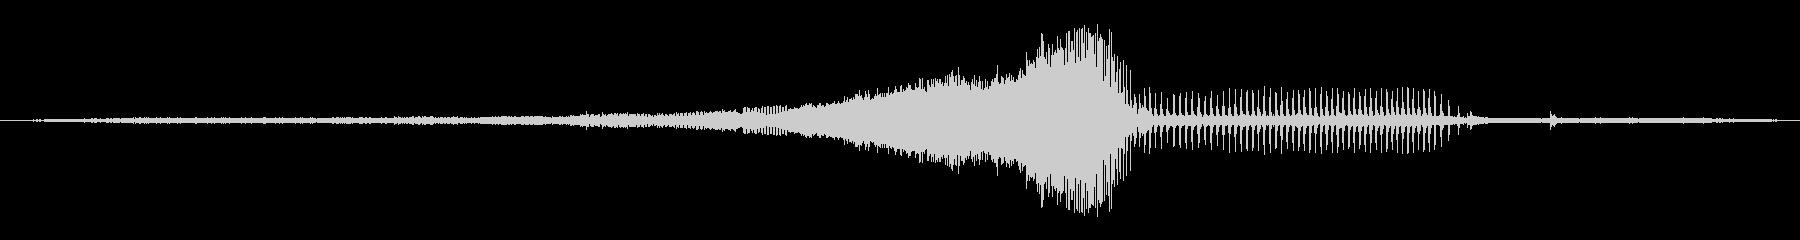 450 CC ATV 4X4:左へ...の未再生の波形